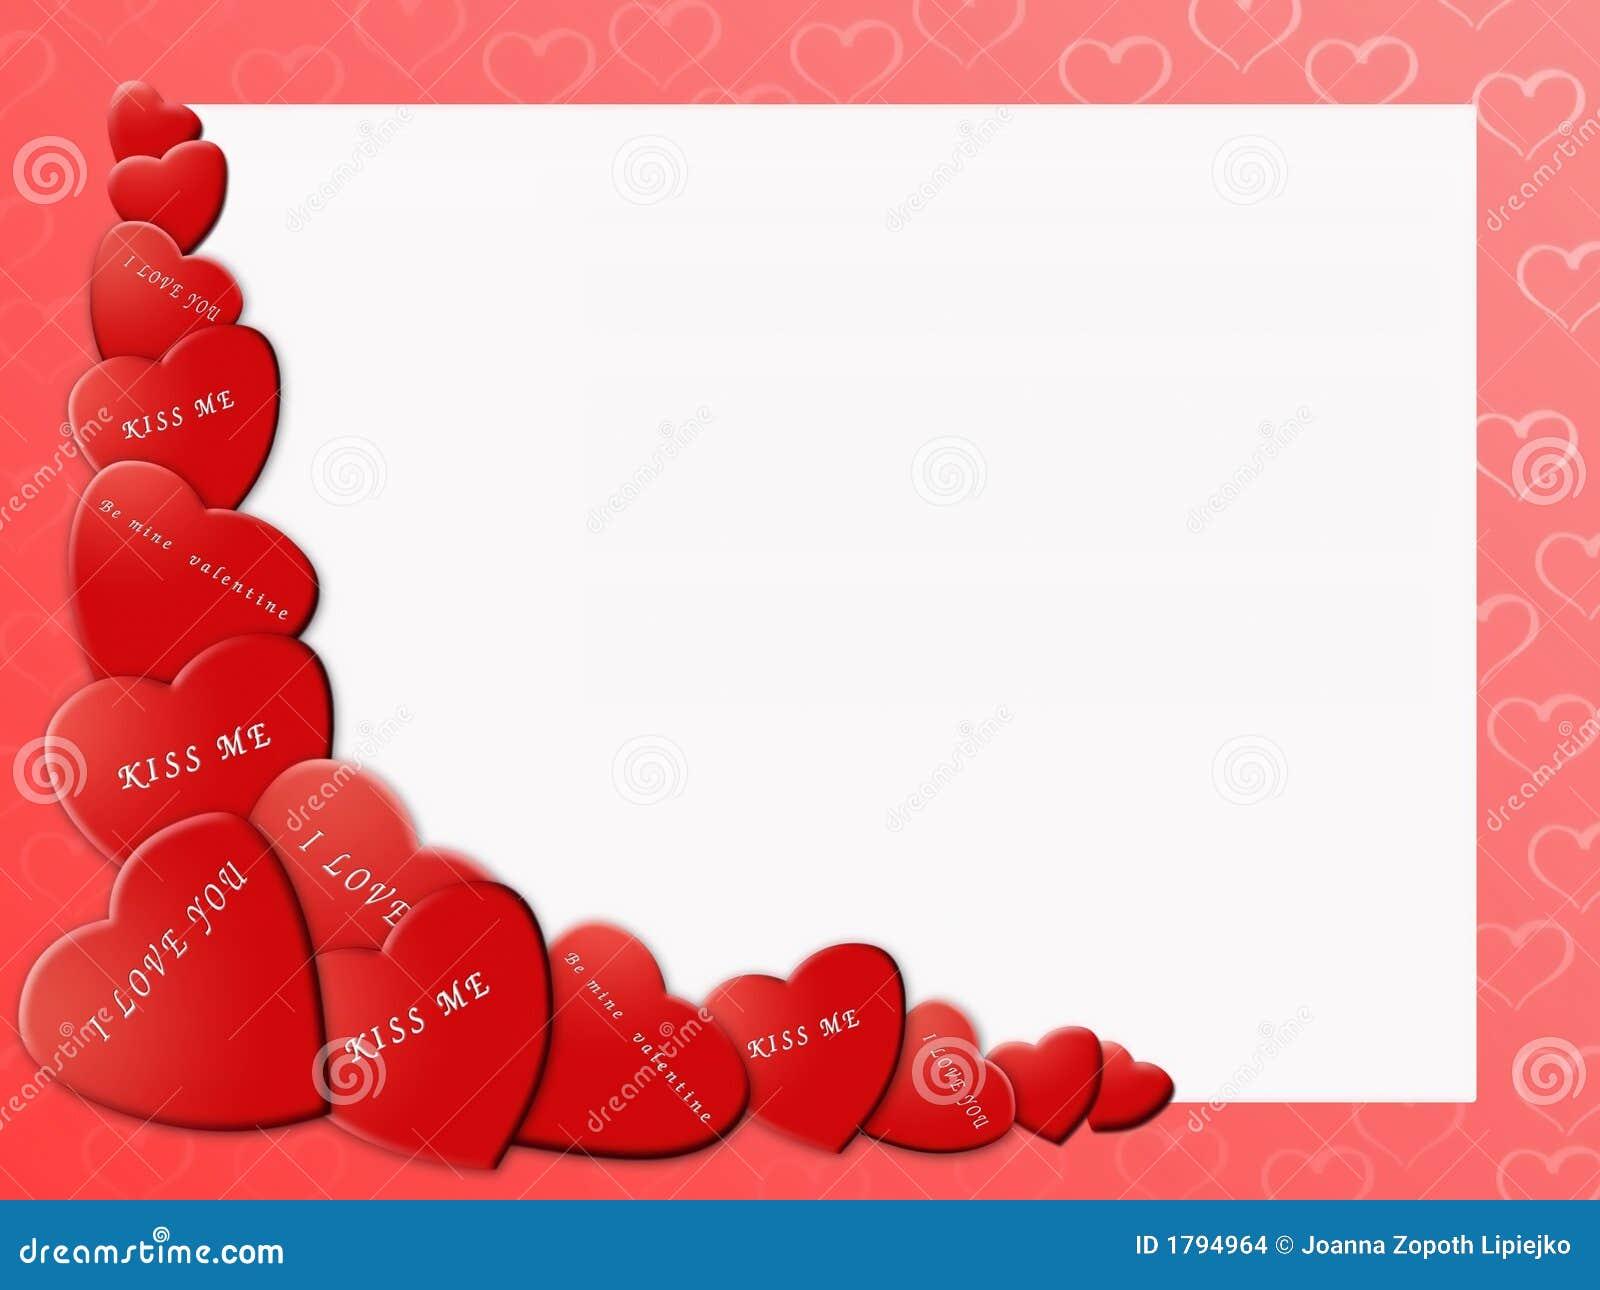 Valentine Border Stock Images - Image: 1794964